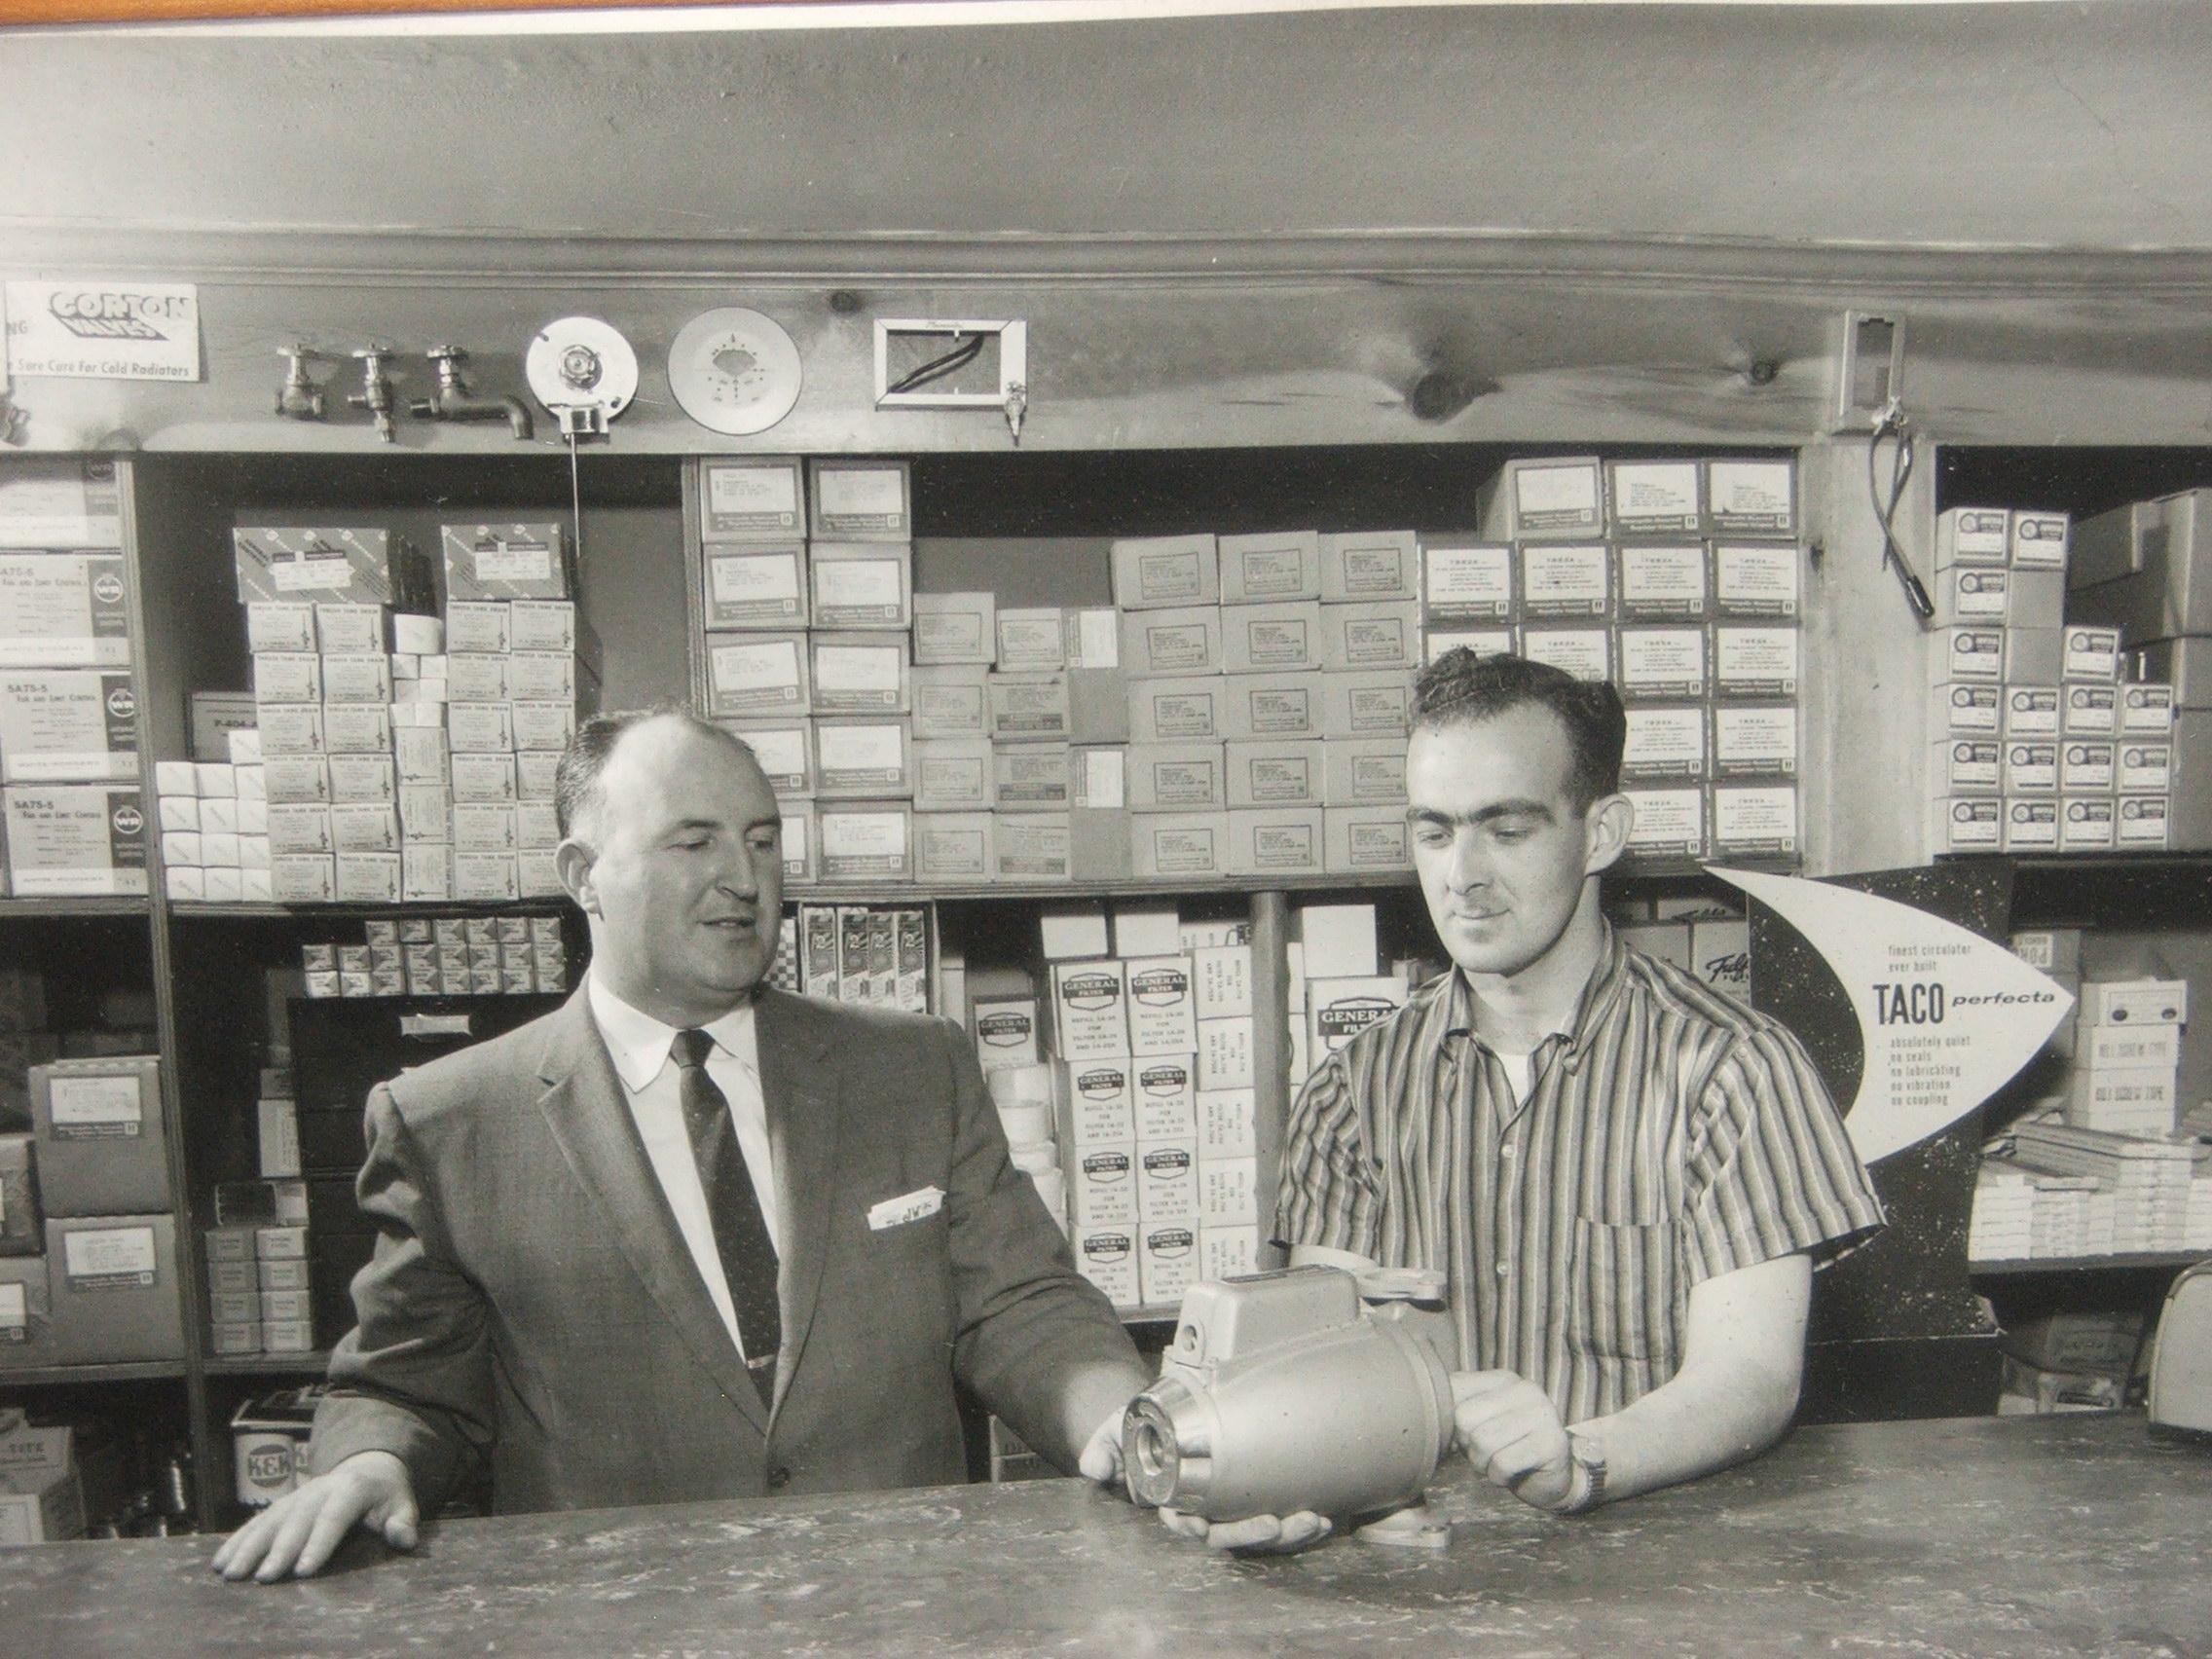 Company founder John F. White (left) and John E. Fogerty holding an early model Taco circulator.